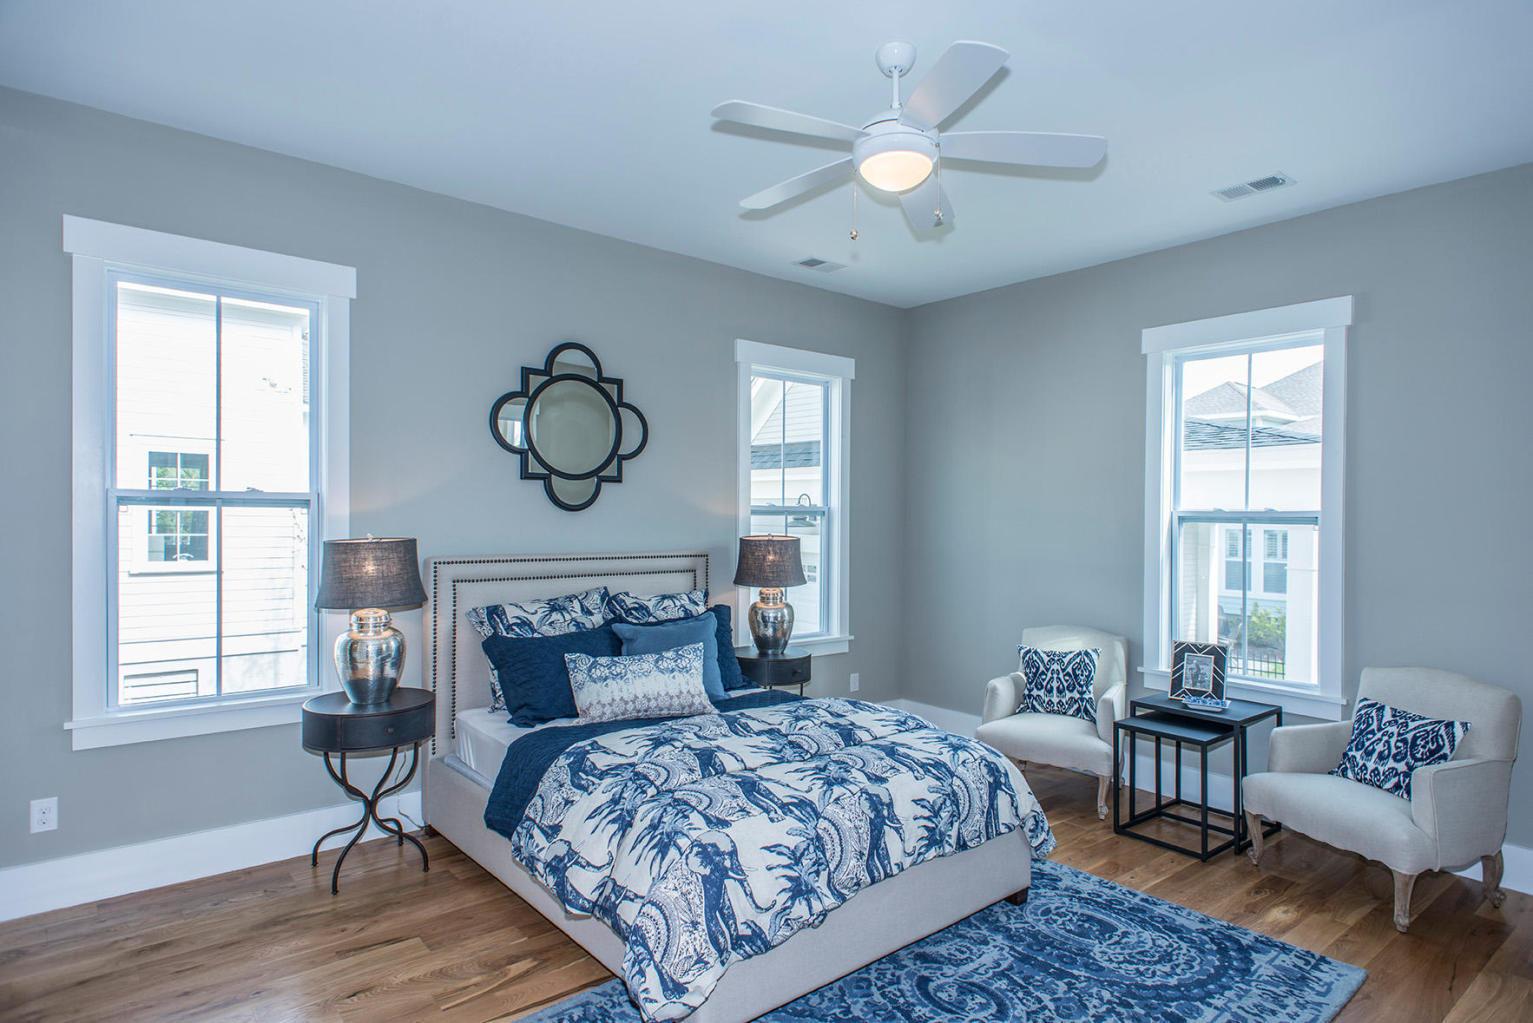 Carolina Park Homes For Sale - 1534 Banning, Mount Pleasant, SC - 11